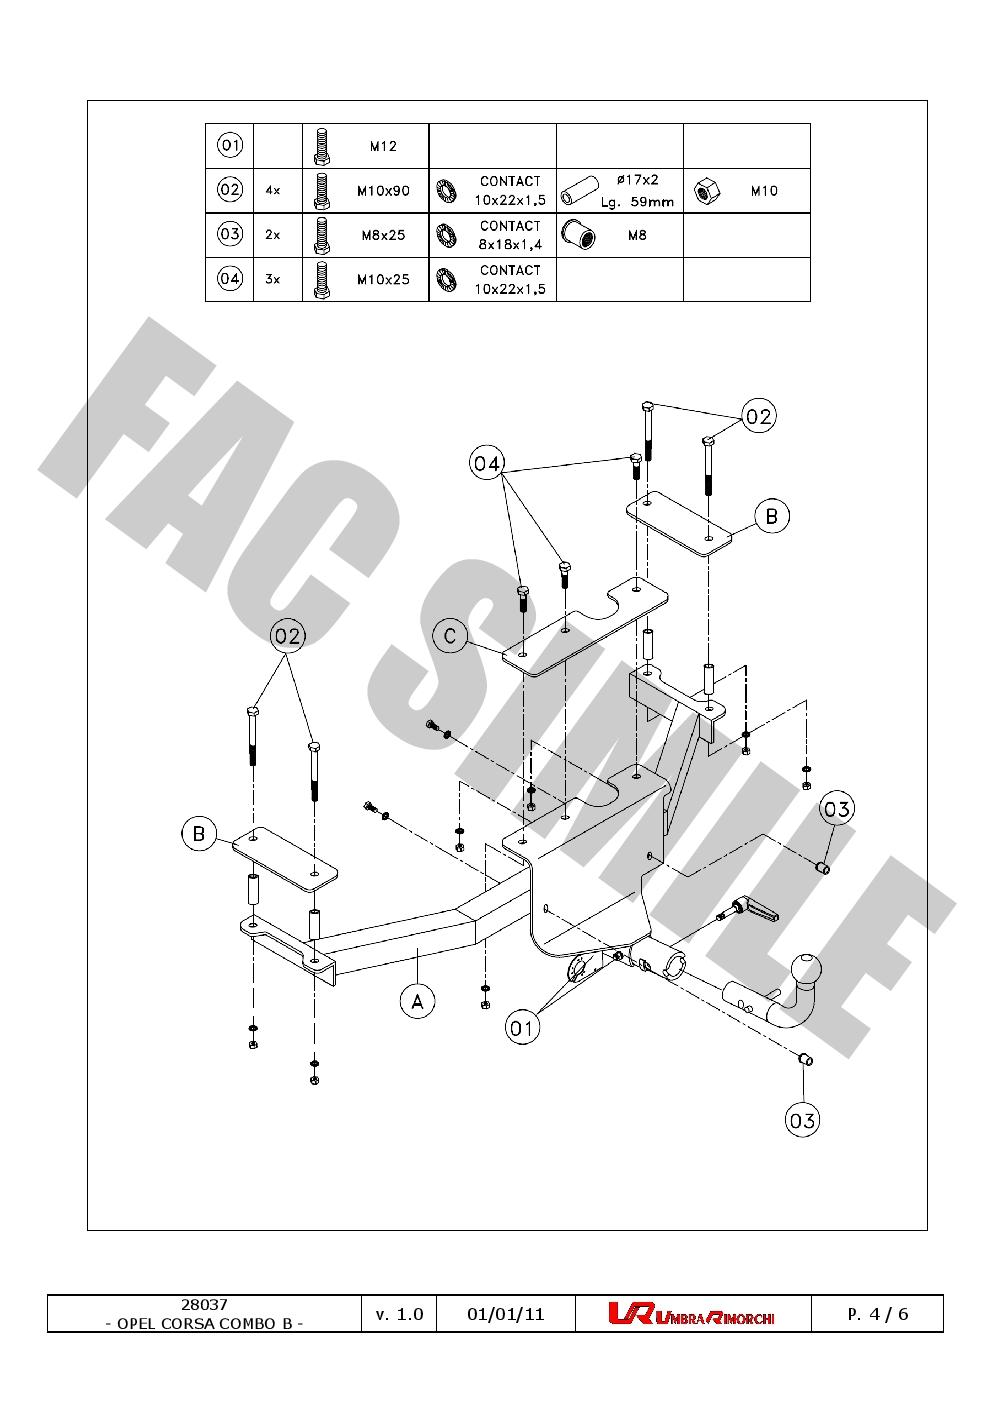 Detach Towbar 13p C2 Wiring Kit for Opel Vauxhall ComboB Van 94